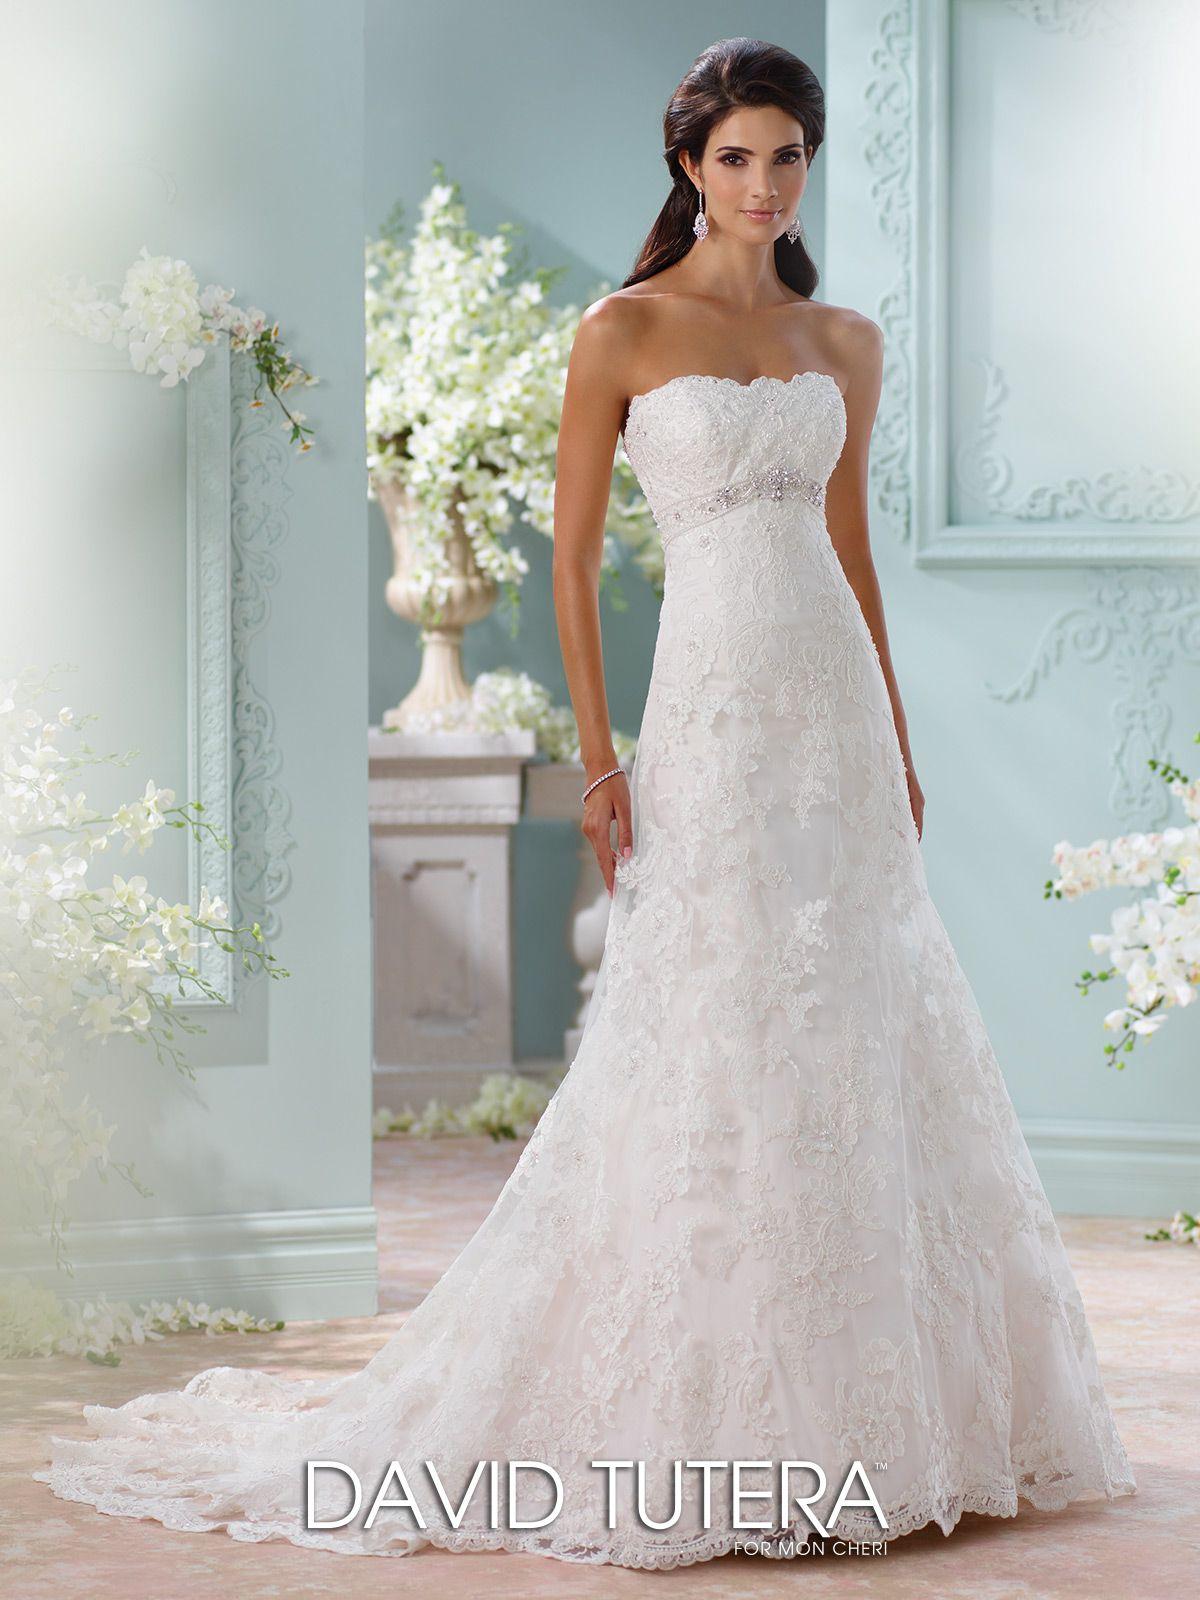 Jeweled & Embroidered Lace A-Line Wedding Dress-113211 Anita ...